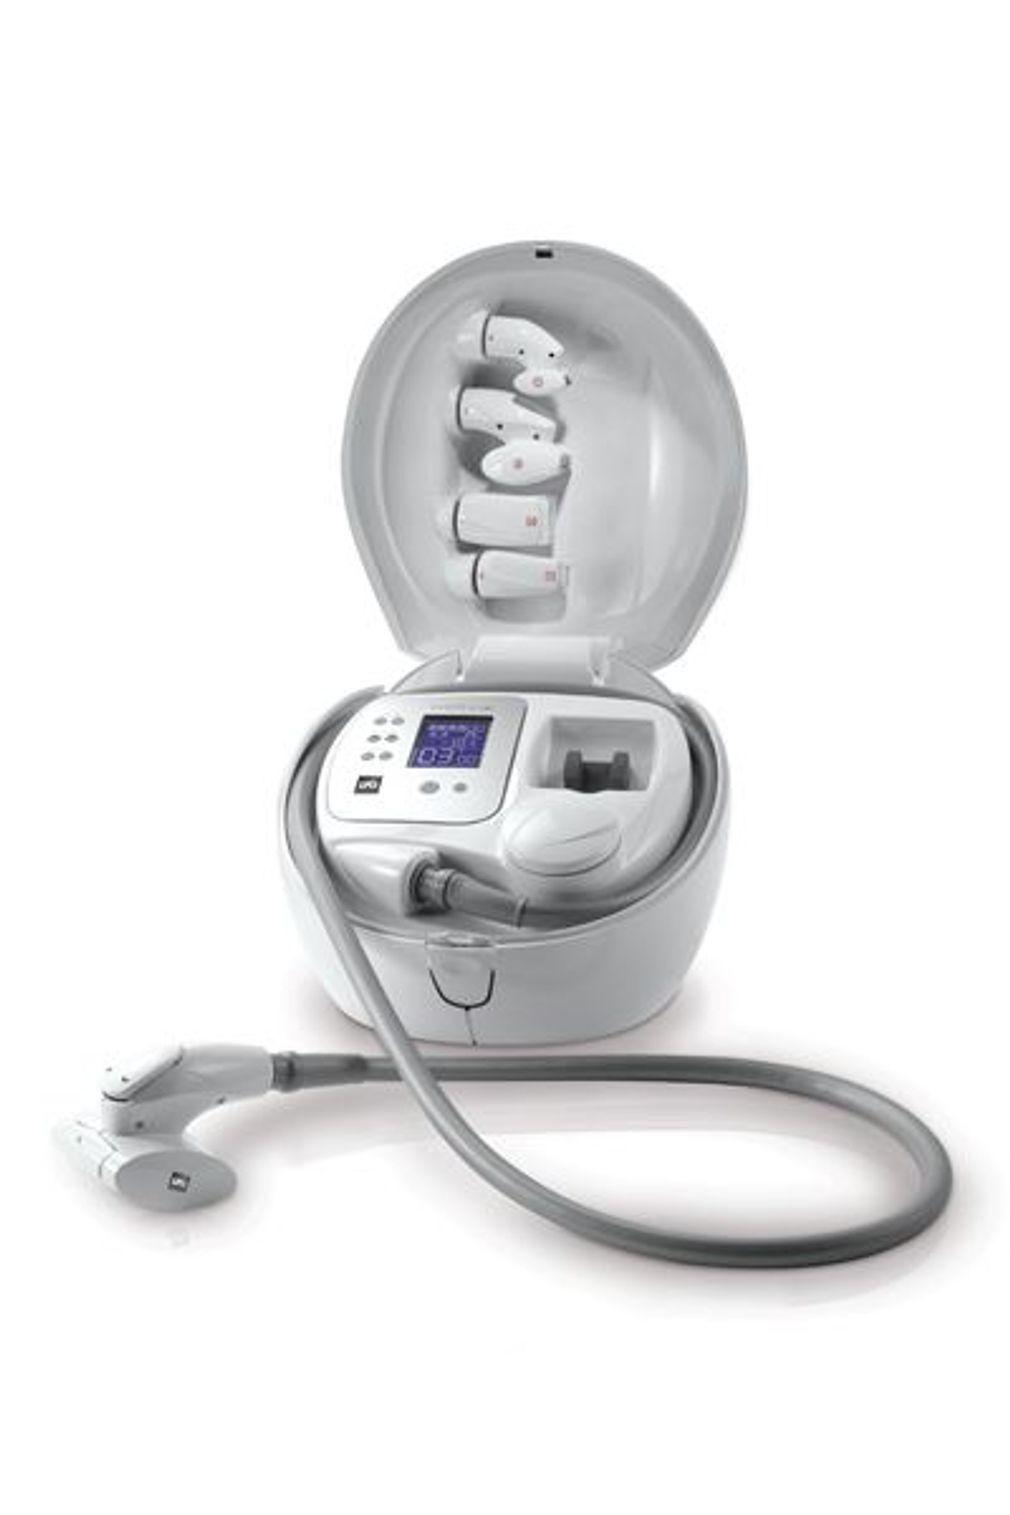 Lpg массажер wellbox s как работает антицеллюлитный массажер